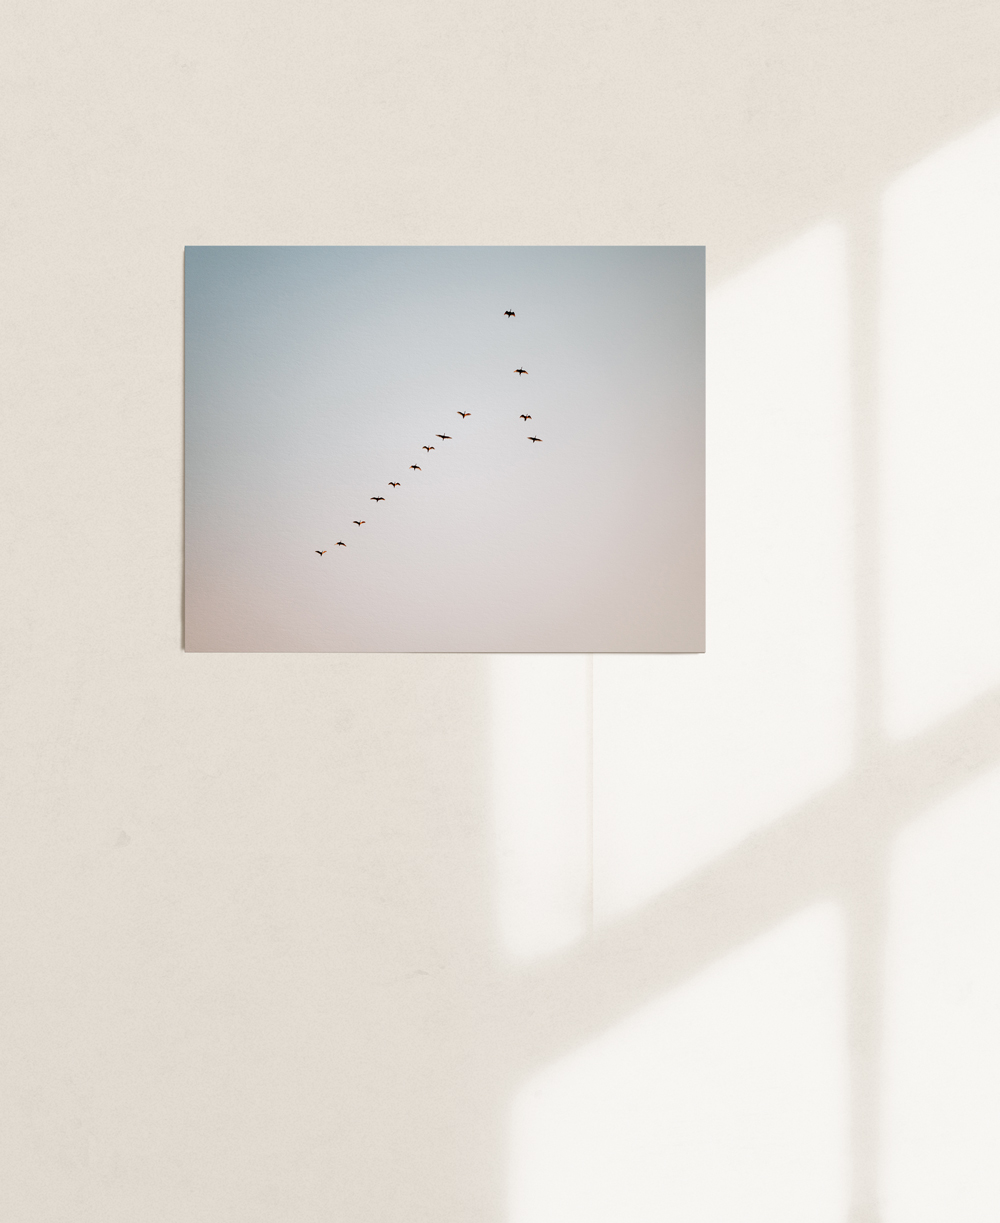 nicischwab-prints-02-002